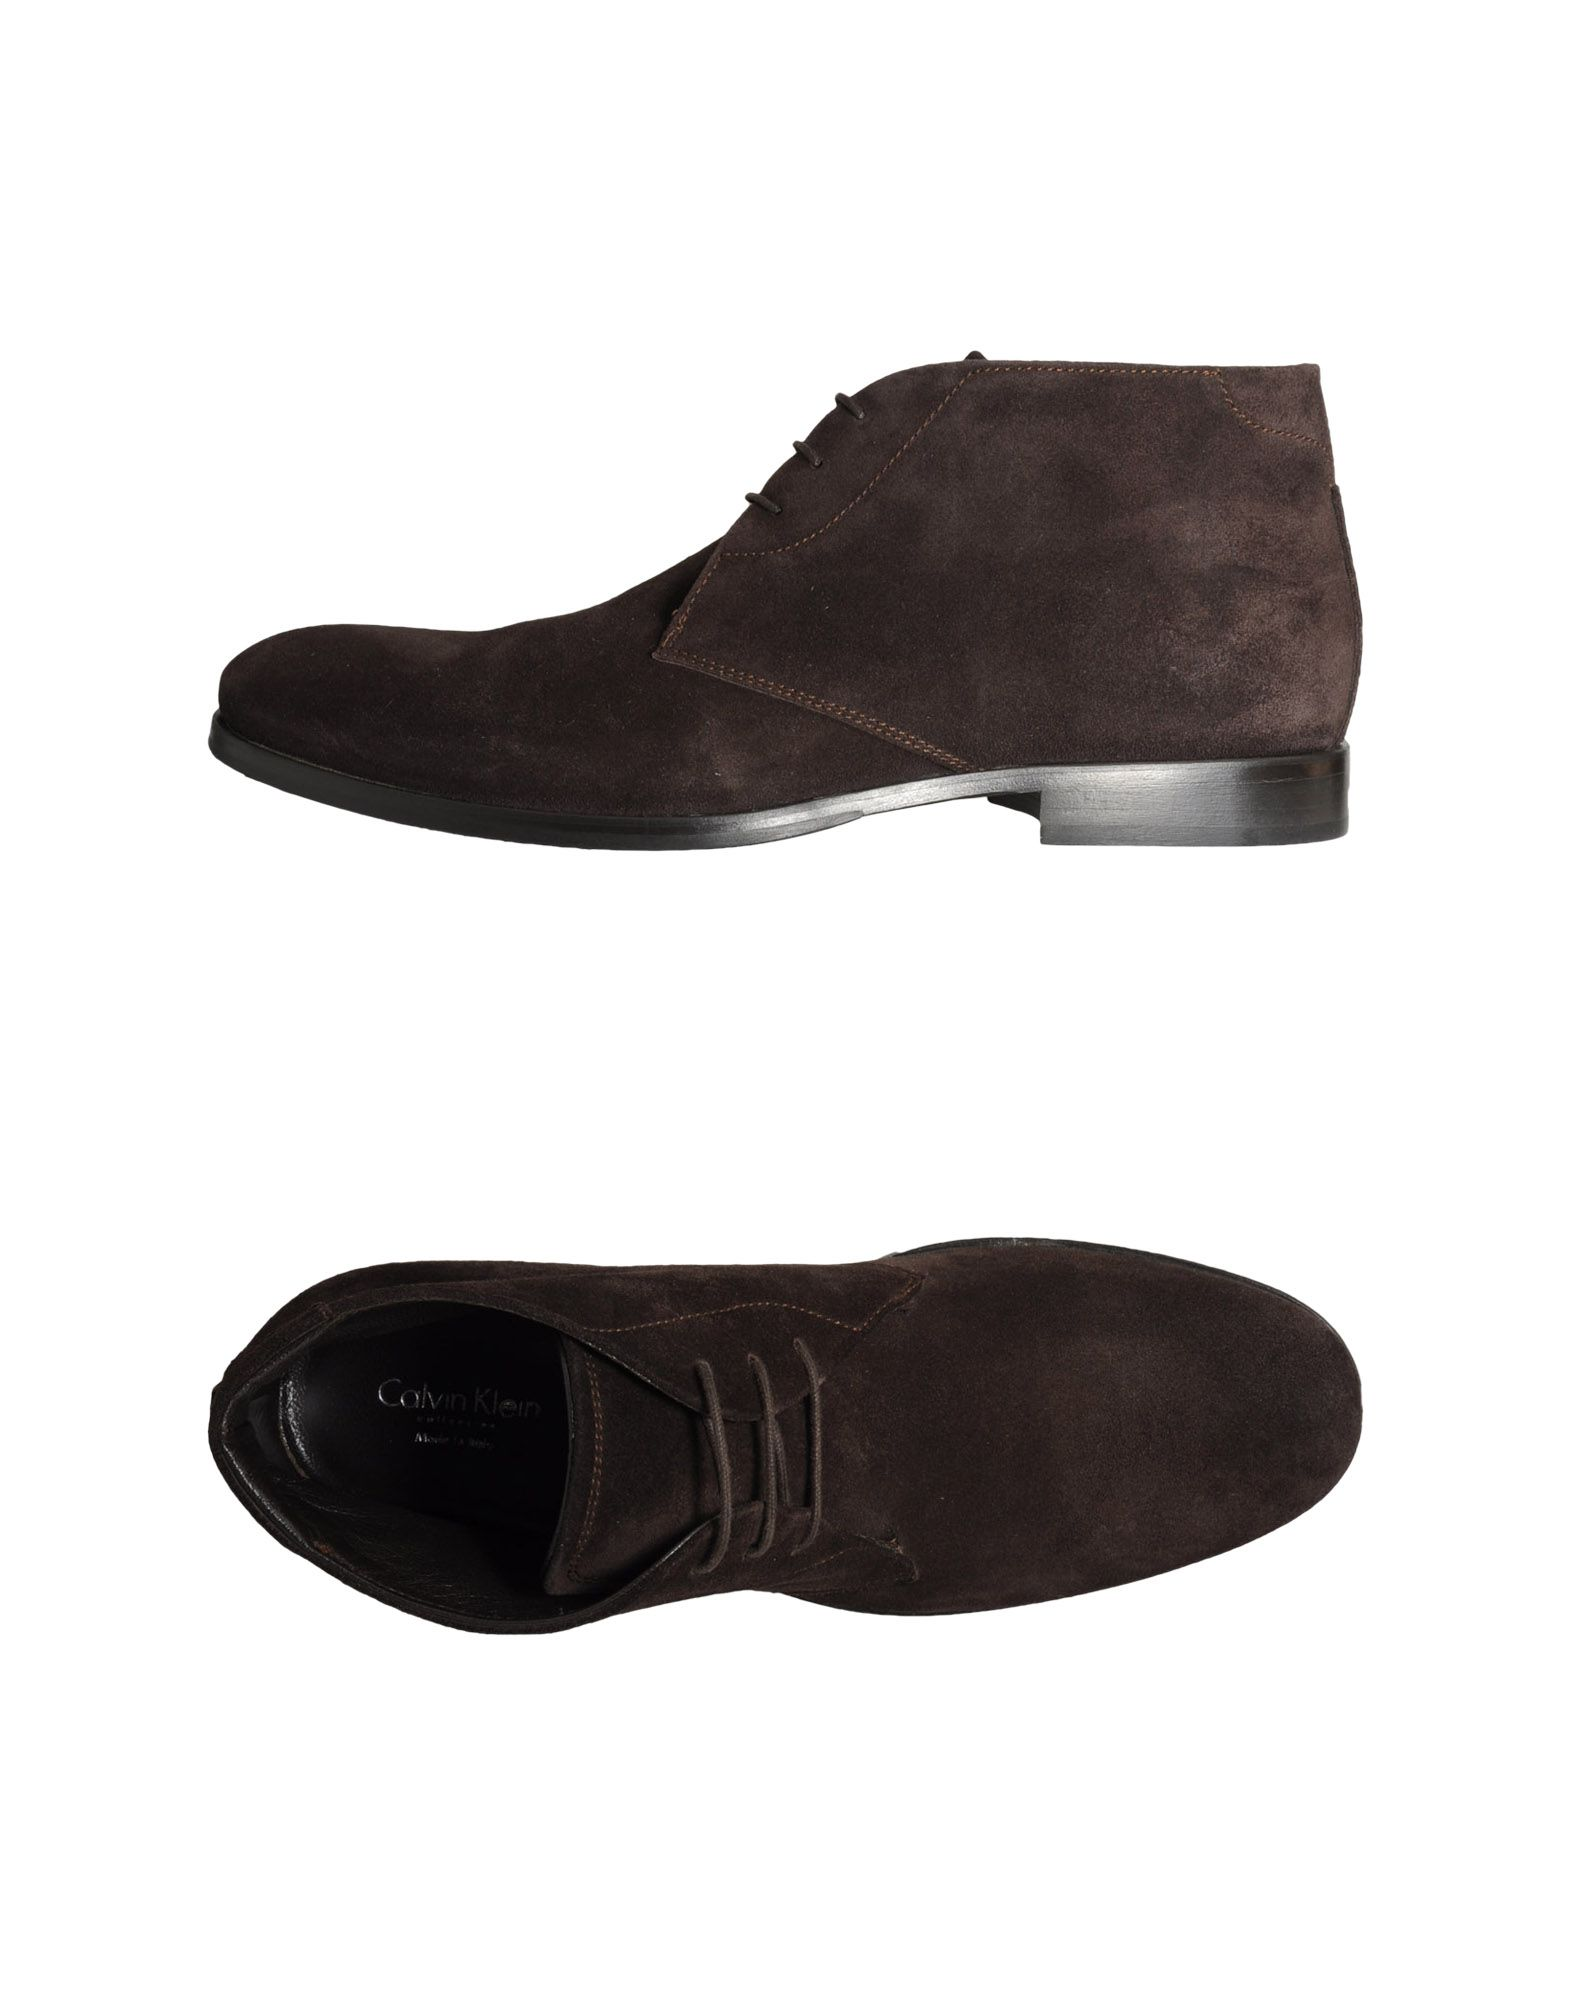 calvin klein hightop dress shoe in brown for lyst